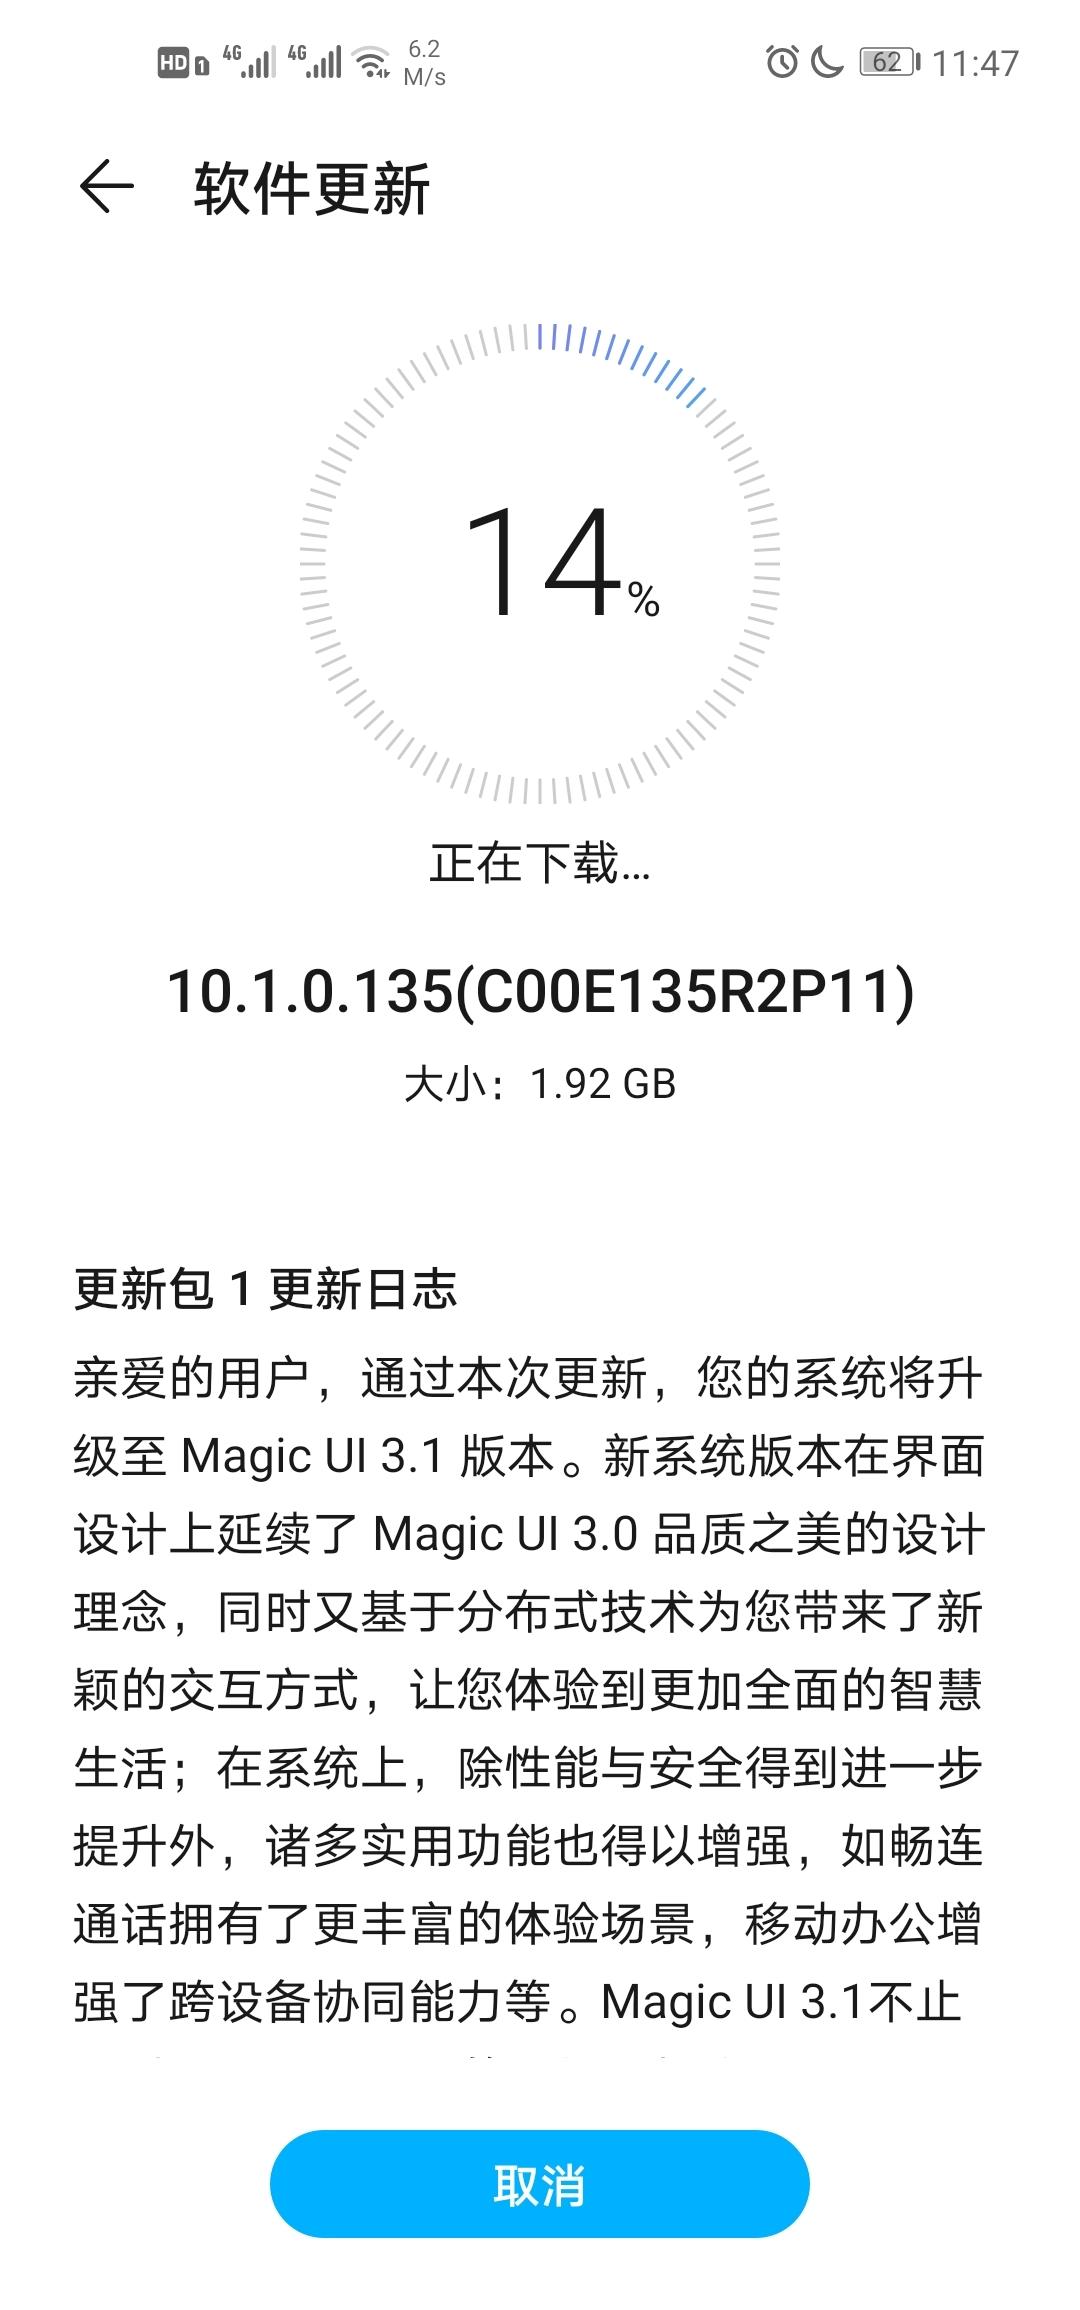 Screenshot_20200515_114750_com.huawei.android.hwouc.jpg